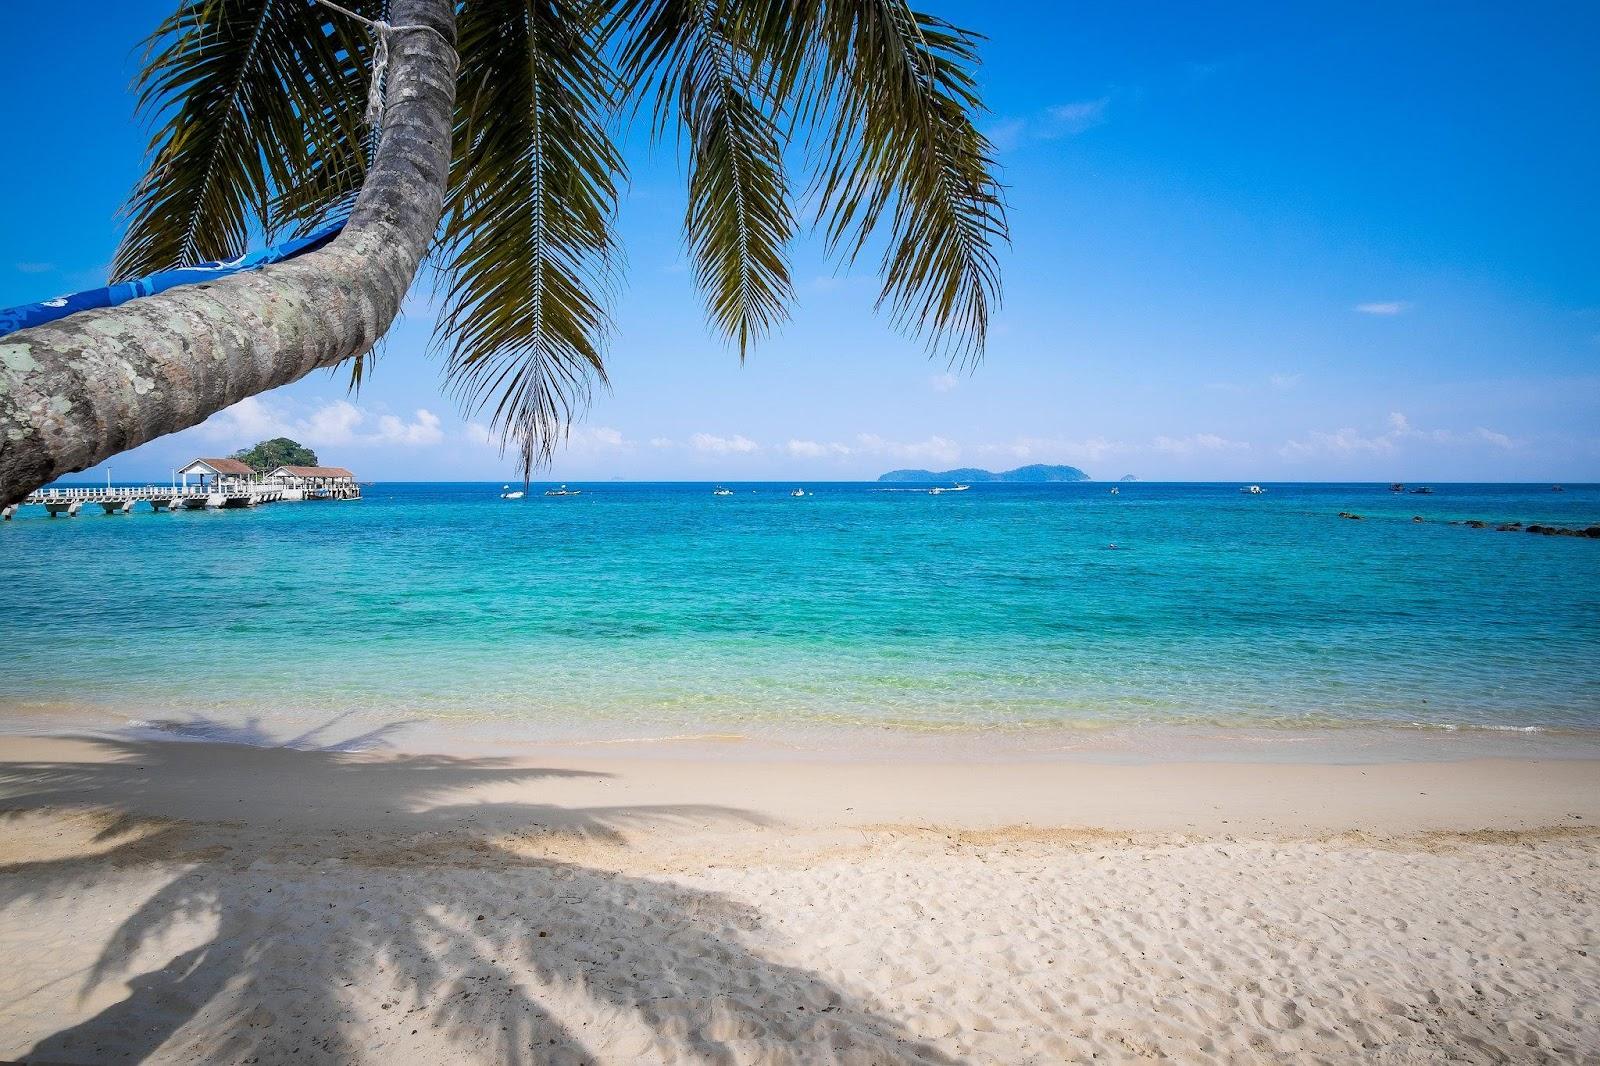 mersing-beach-turquoise-pulau-tioman-malaysia